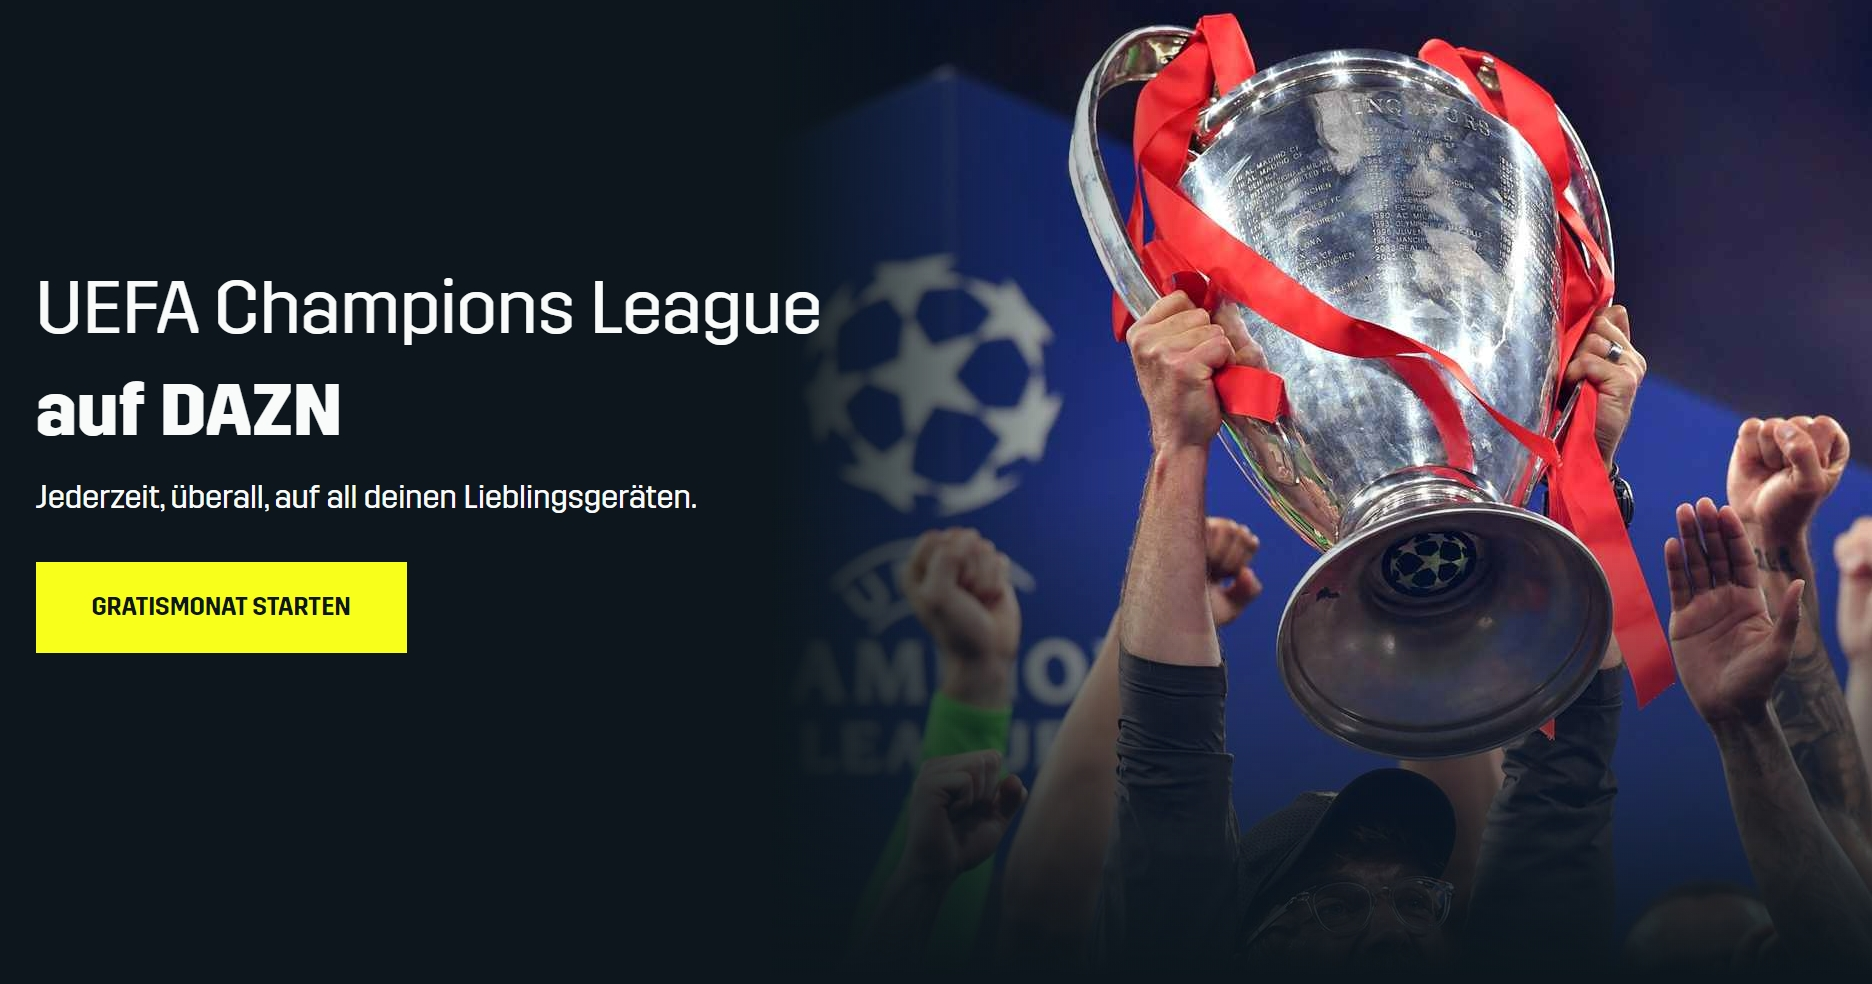 dazn-champions-league-angebot